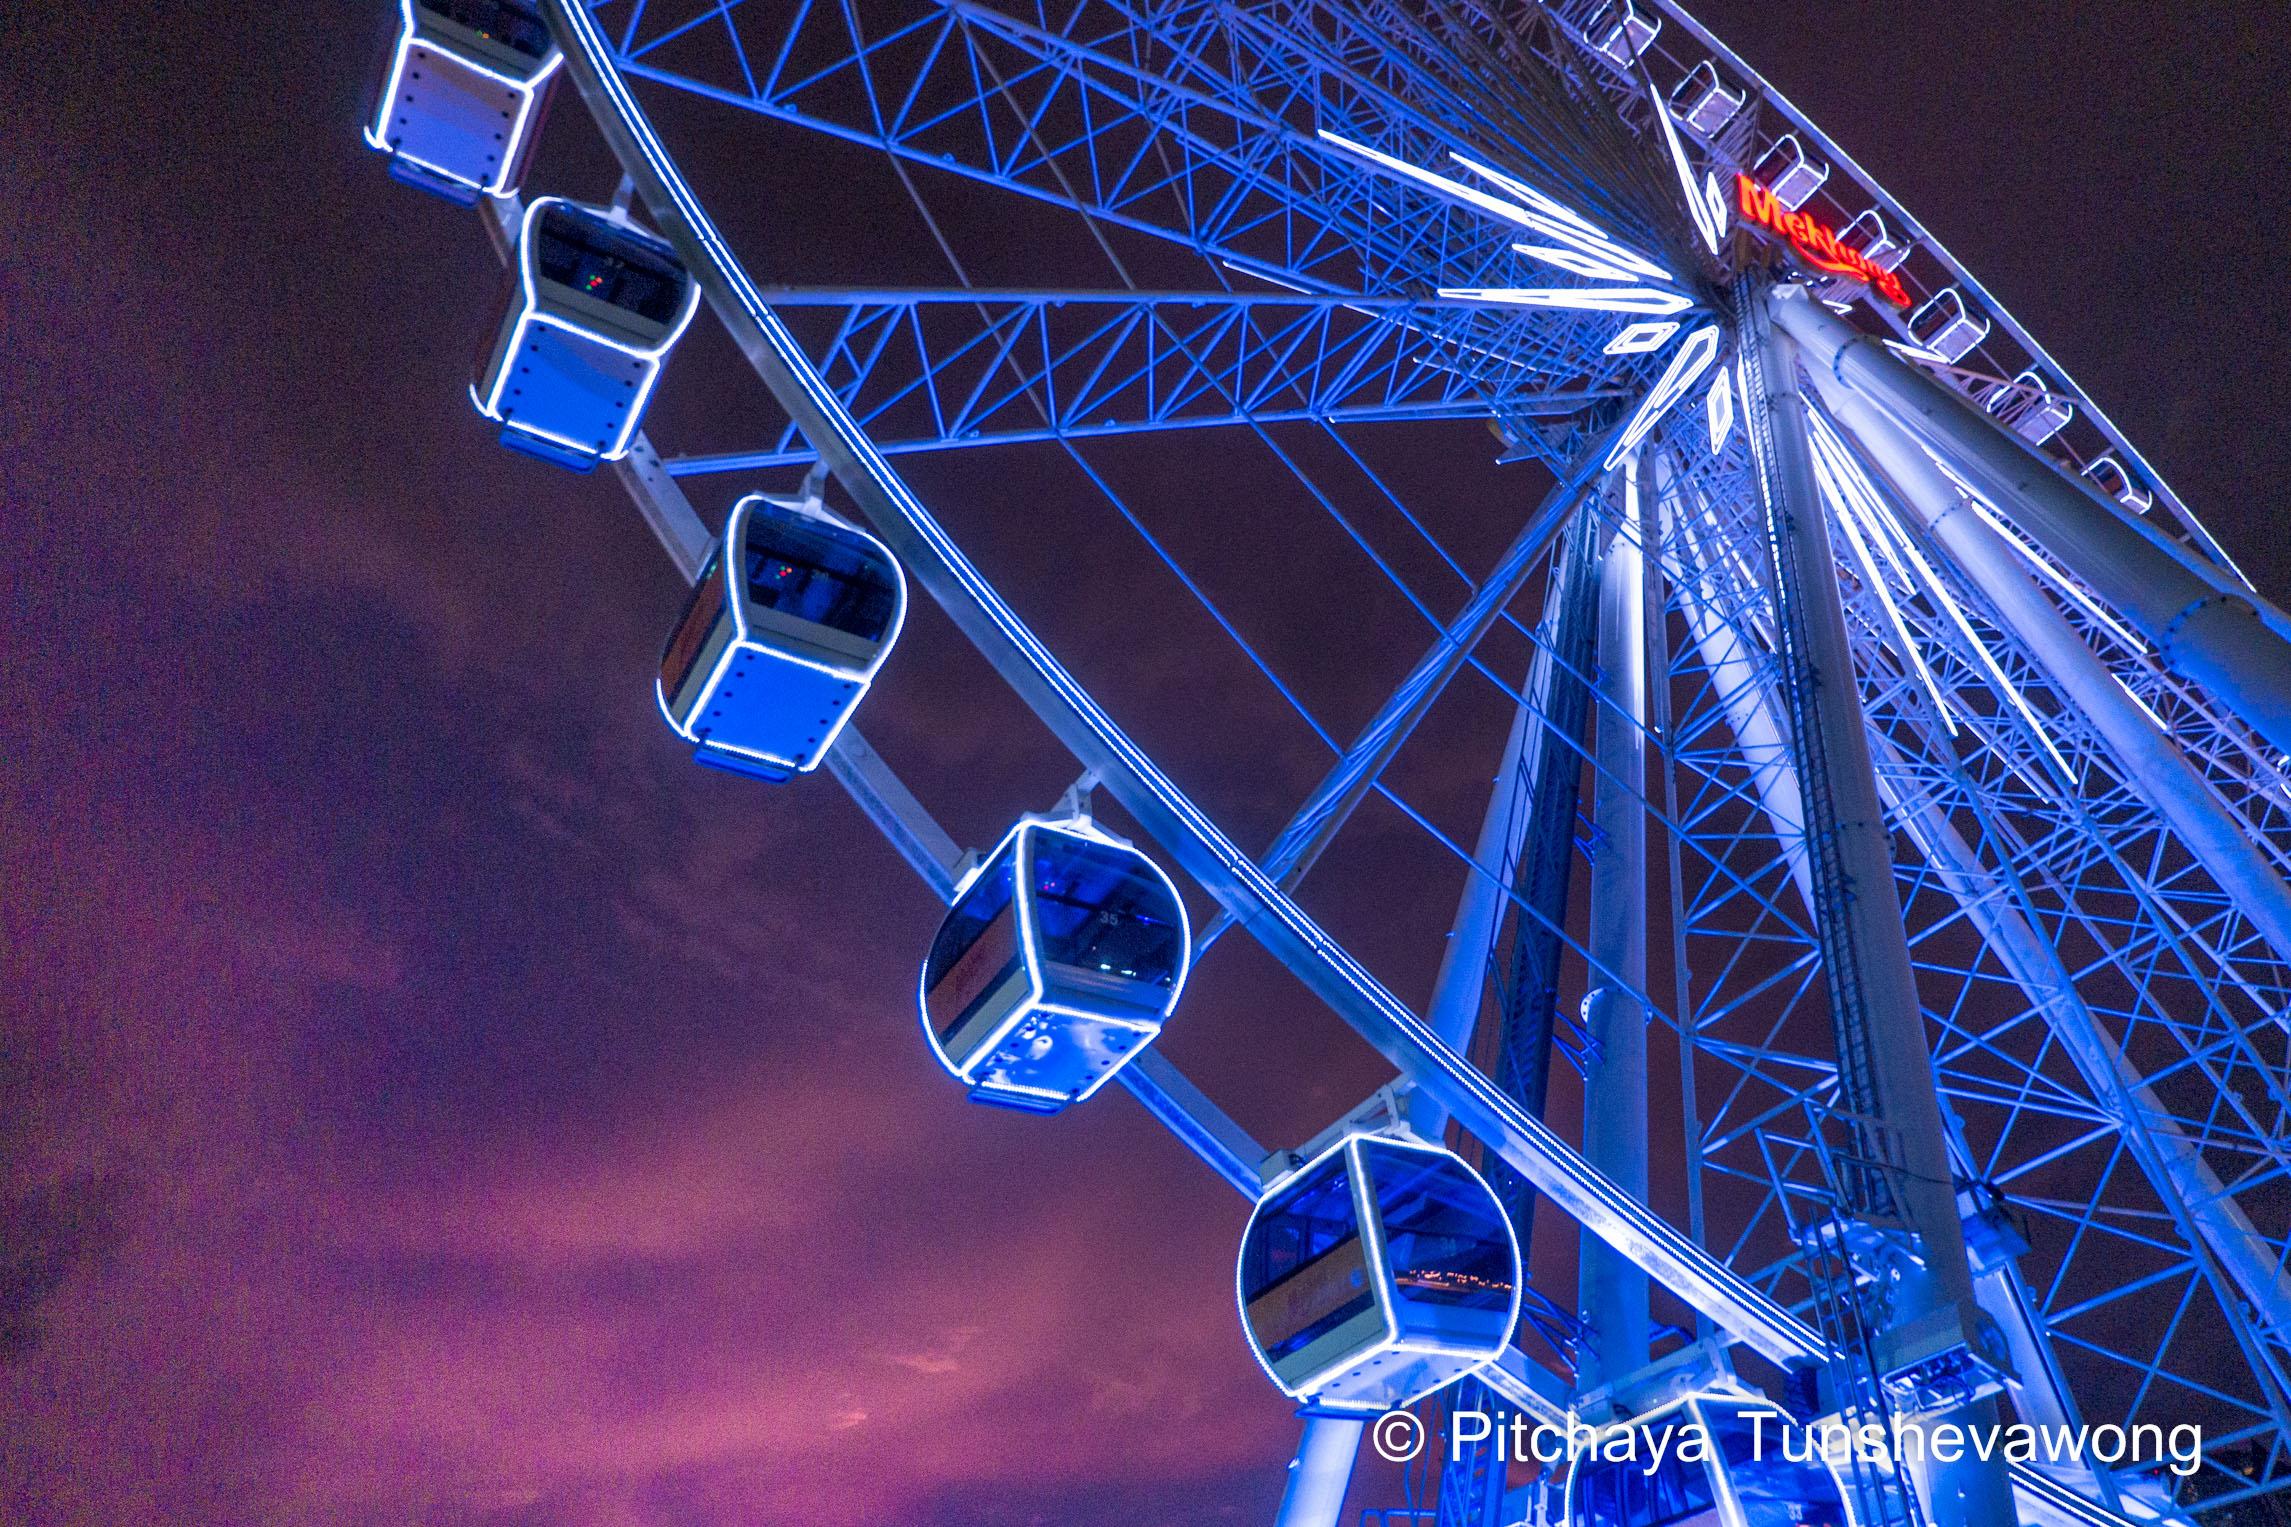 the Asiatique's landmark: Ferris wheel